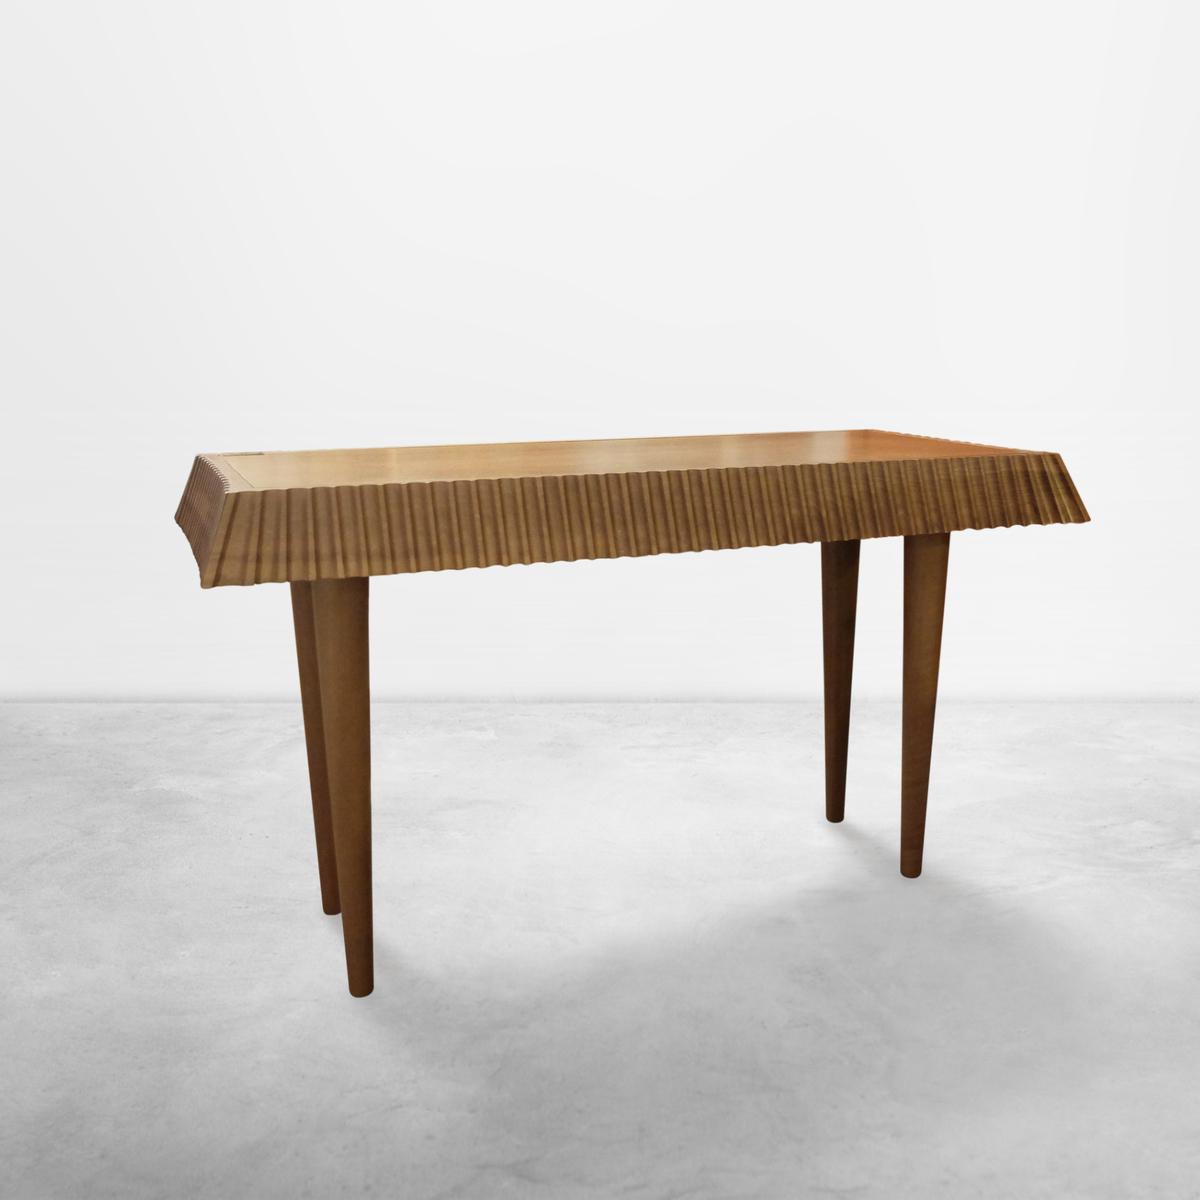 "Ugo La Pietra for Boffi, Original Protoype of ""Ballerina"" Consolle in Wood, 1987"